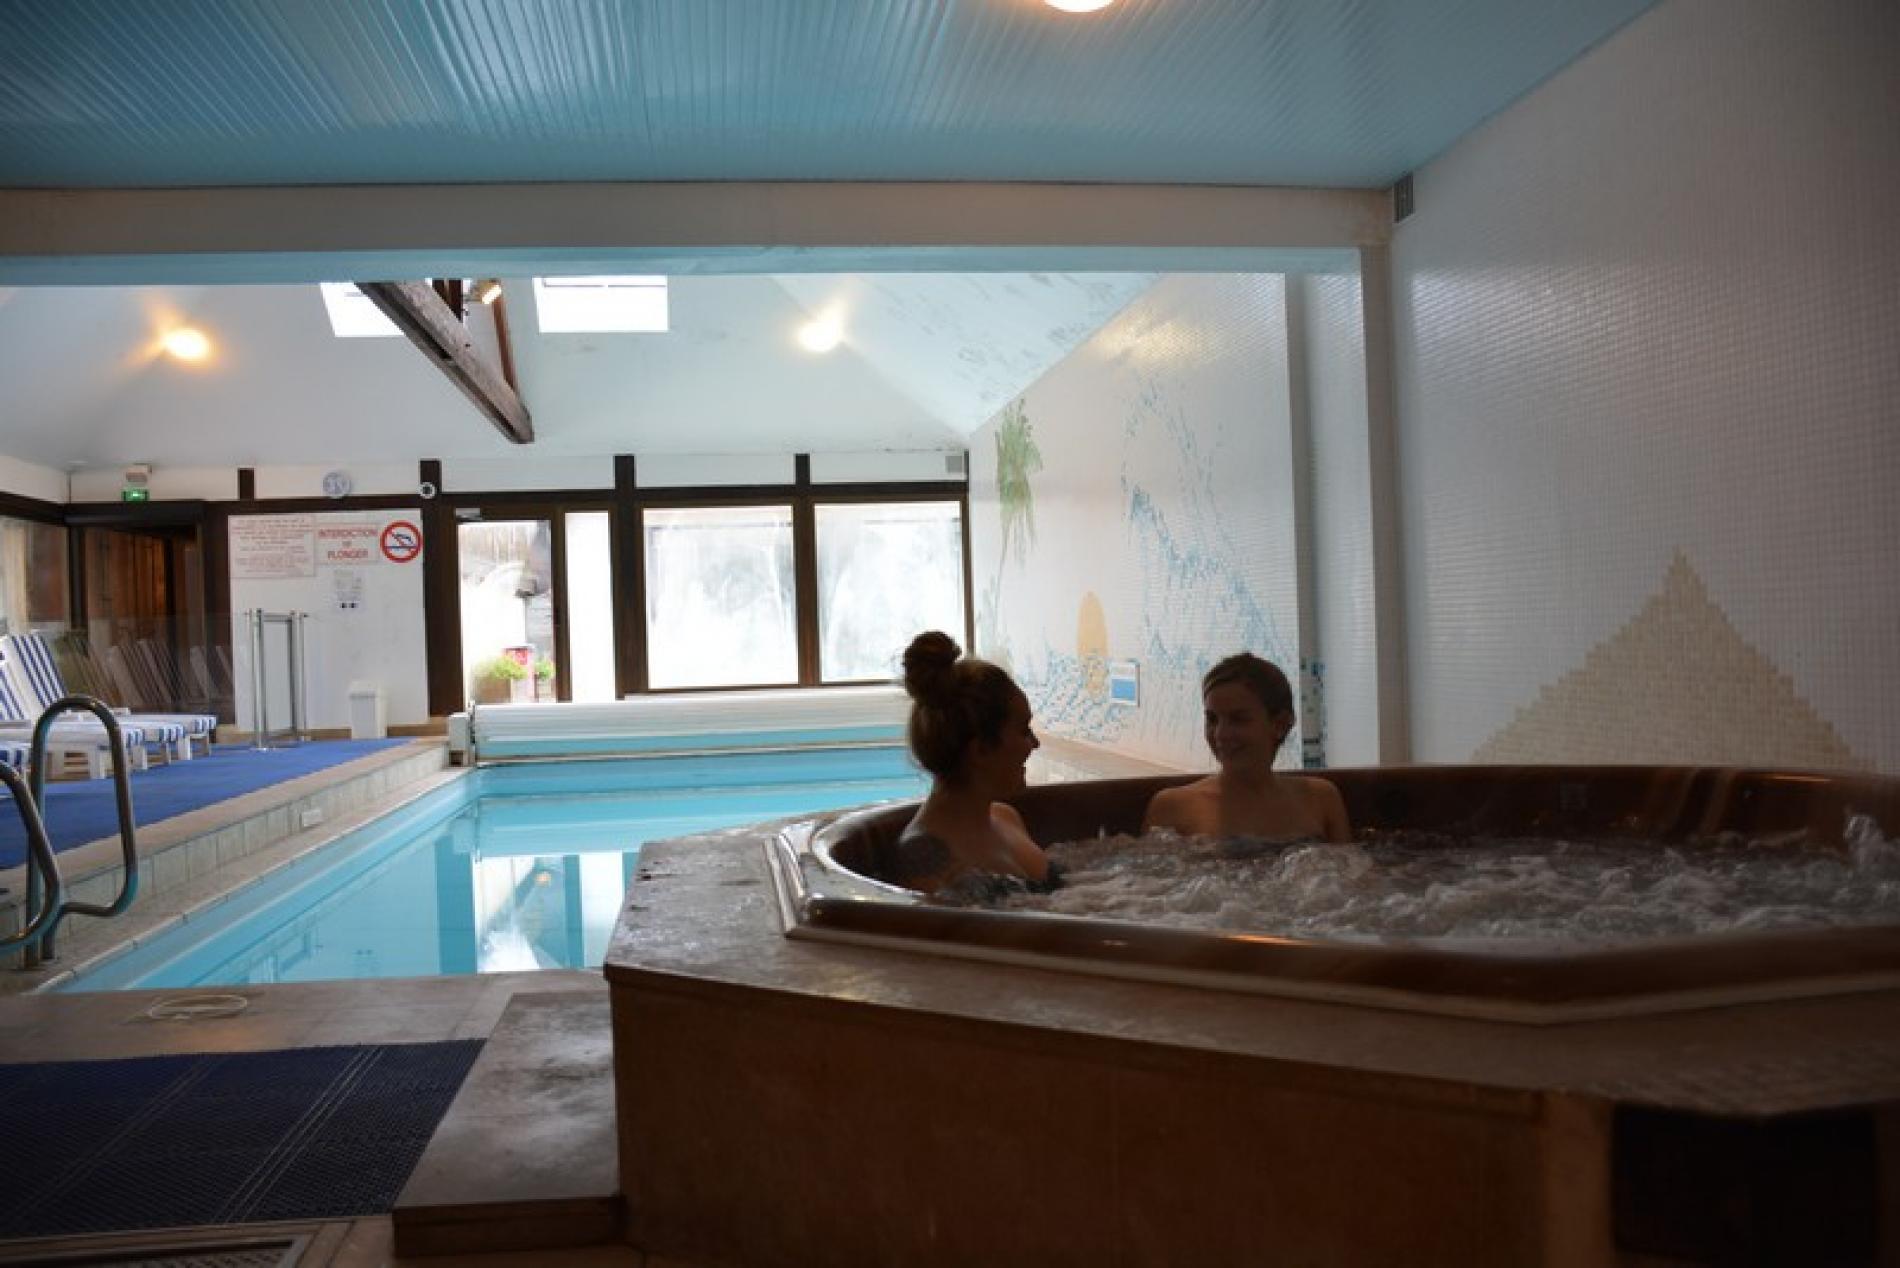 Hotel deauville avec piscine hotel 3 toiles deauville for Piscine deauville spa